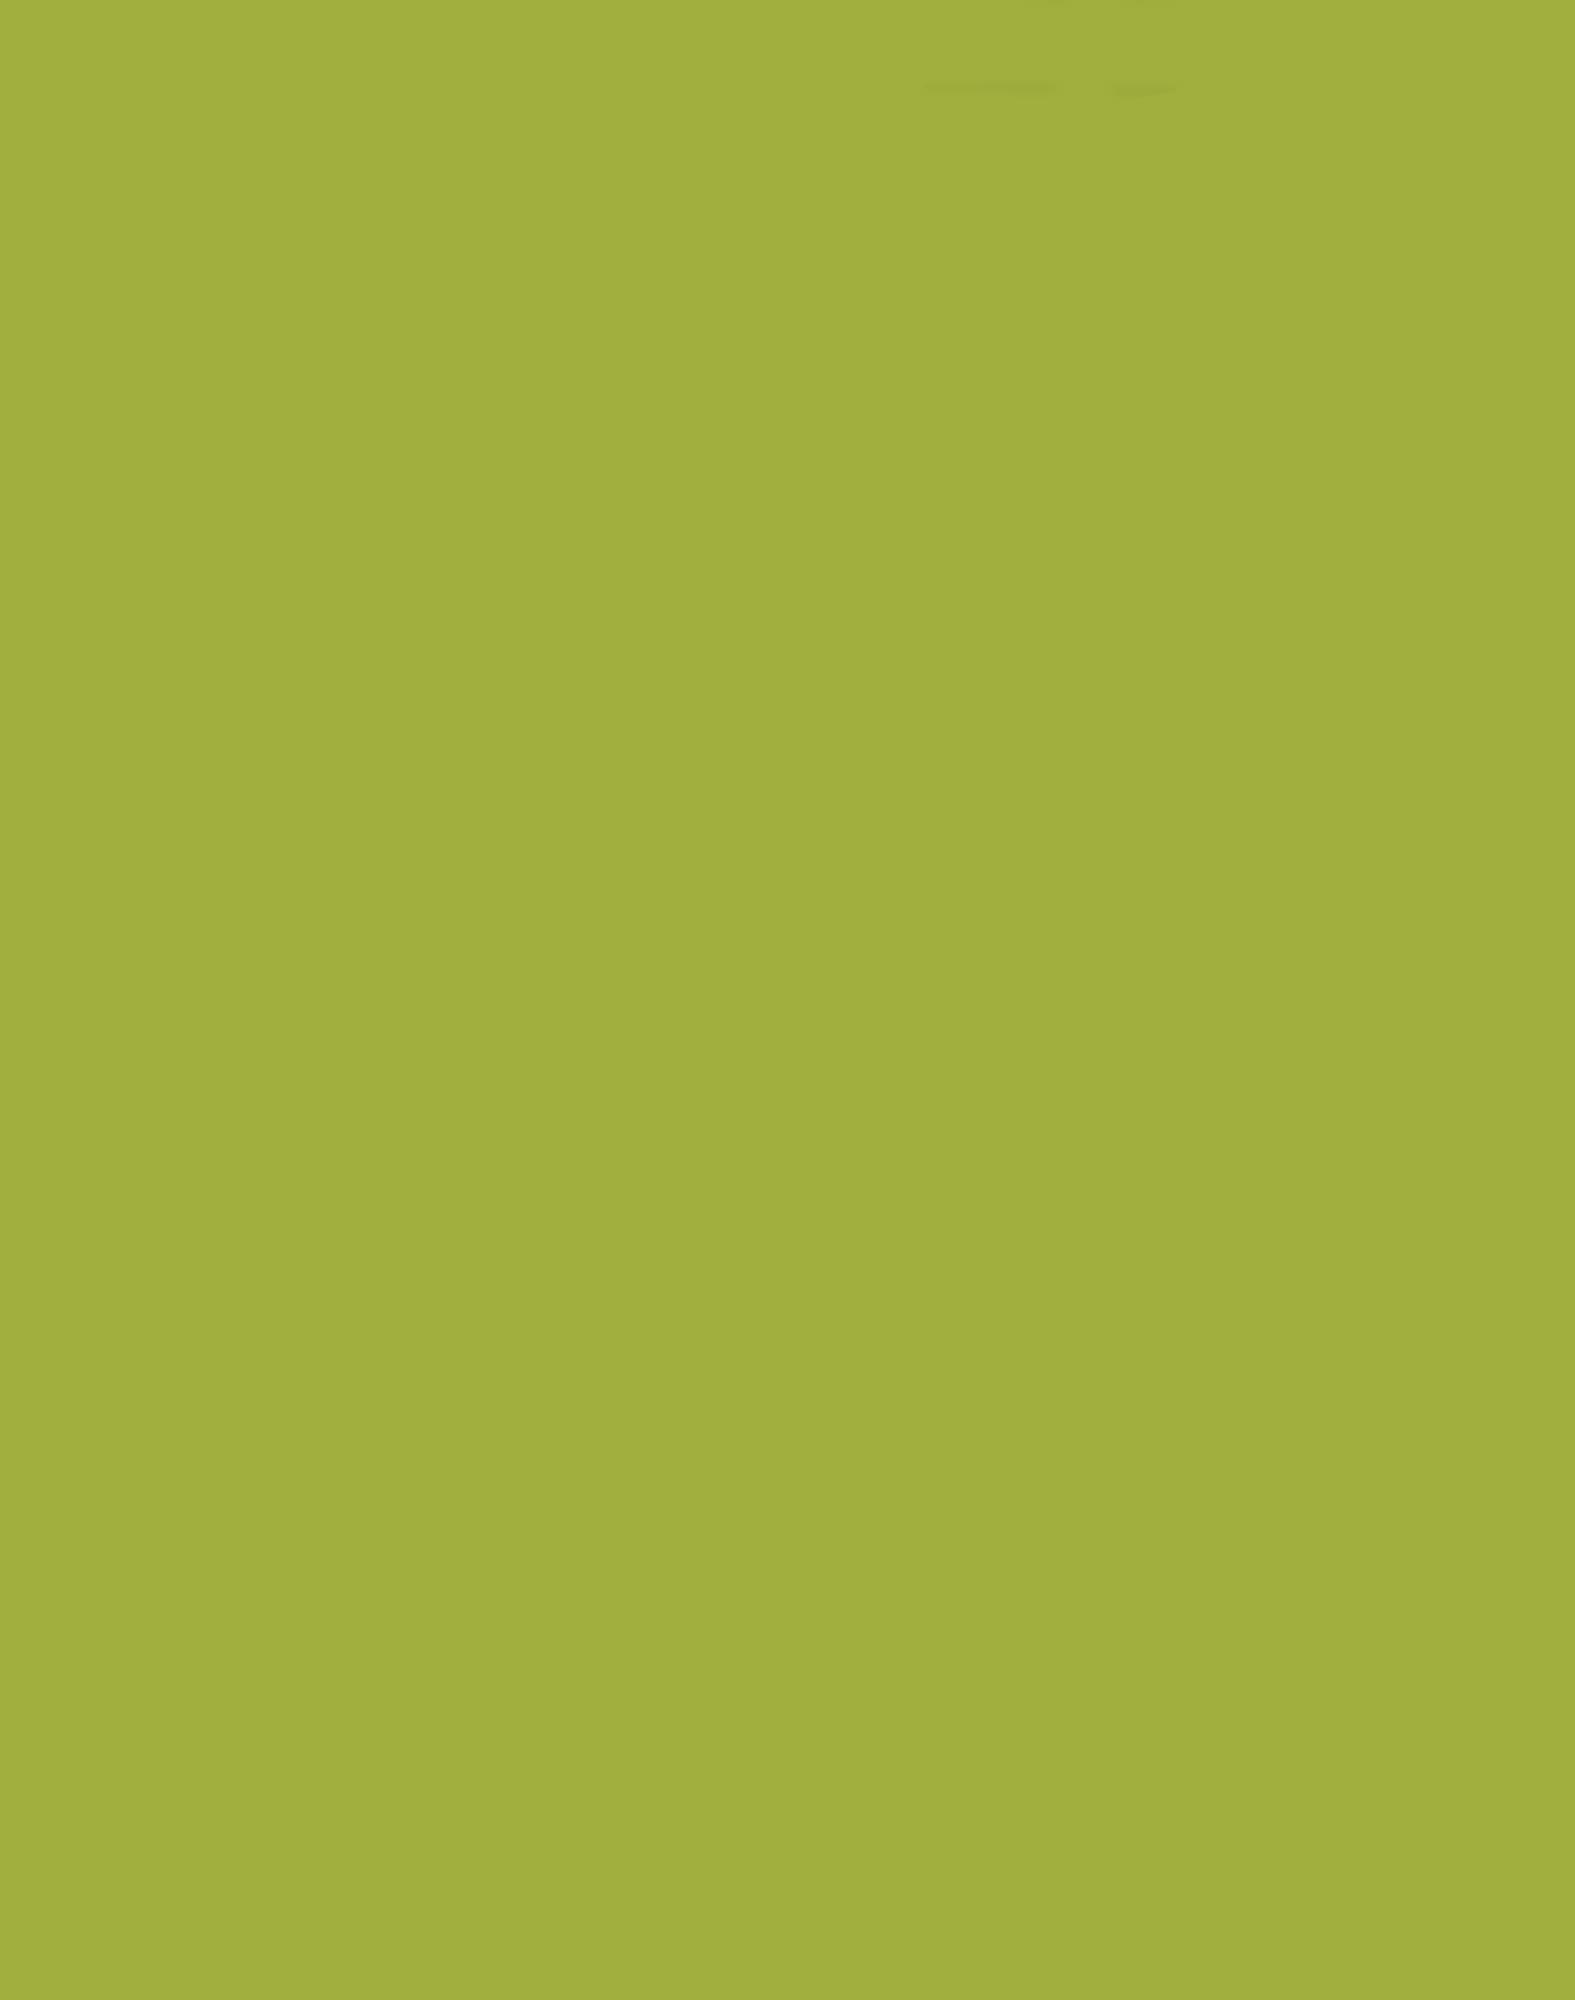 Tropical Jungle 161,175,62